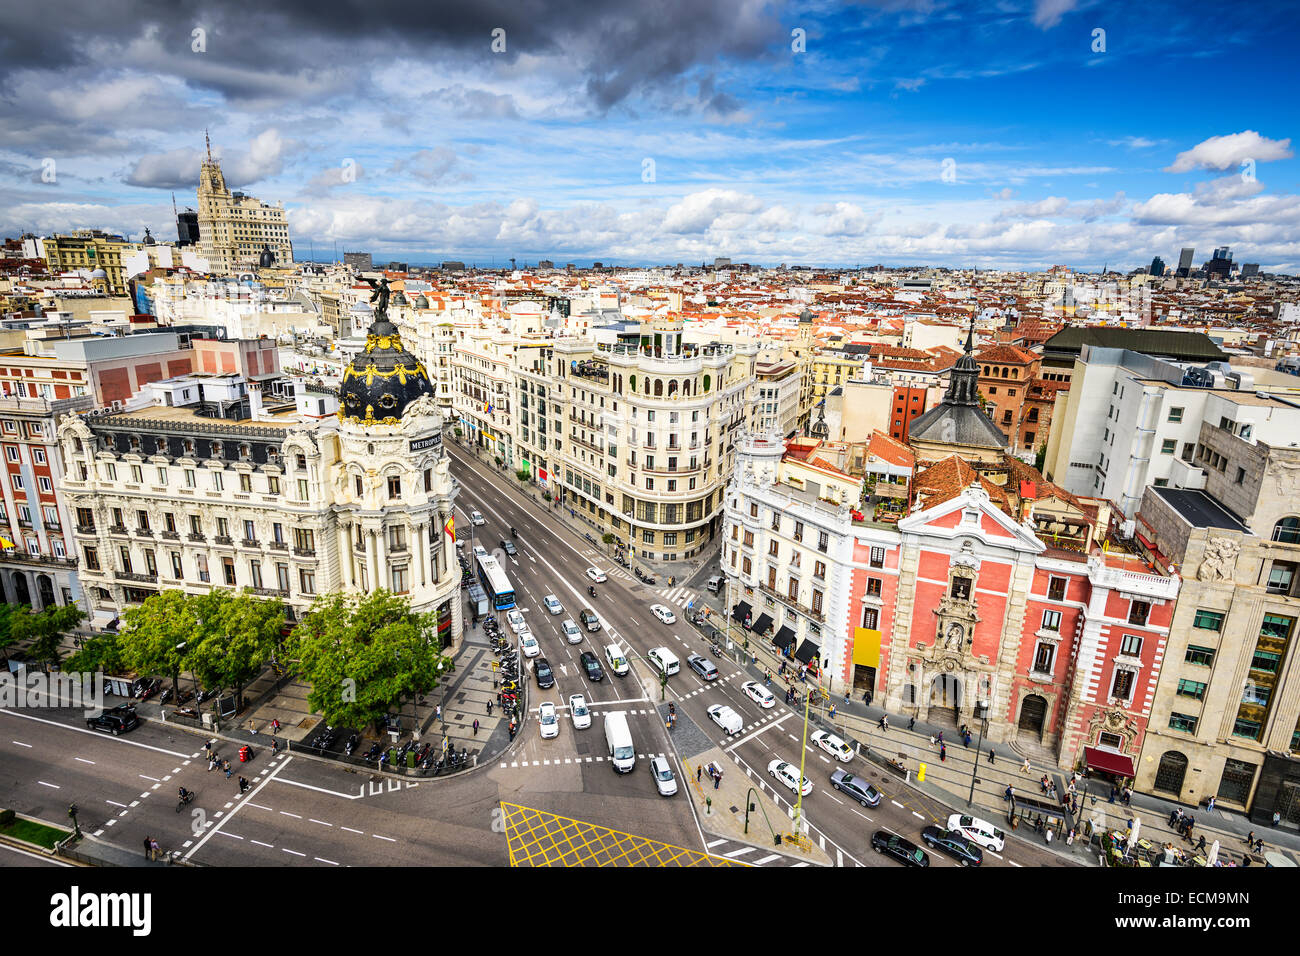 Madrid, Spain cityscape above Gran Via shopping street. - Stock Image